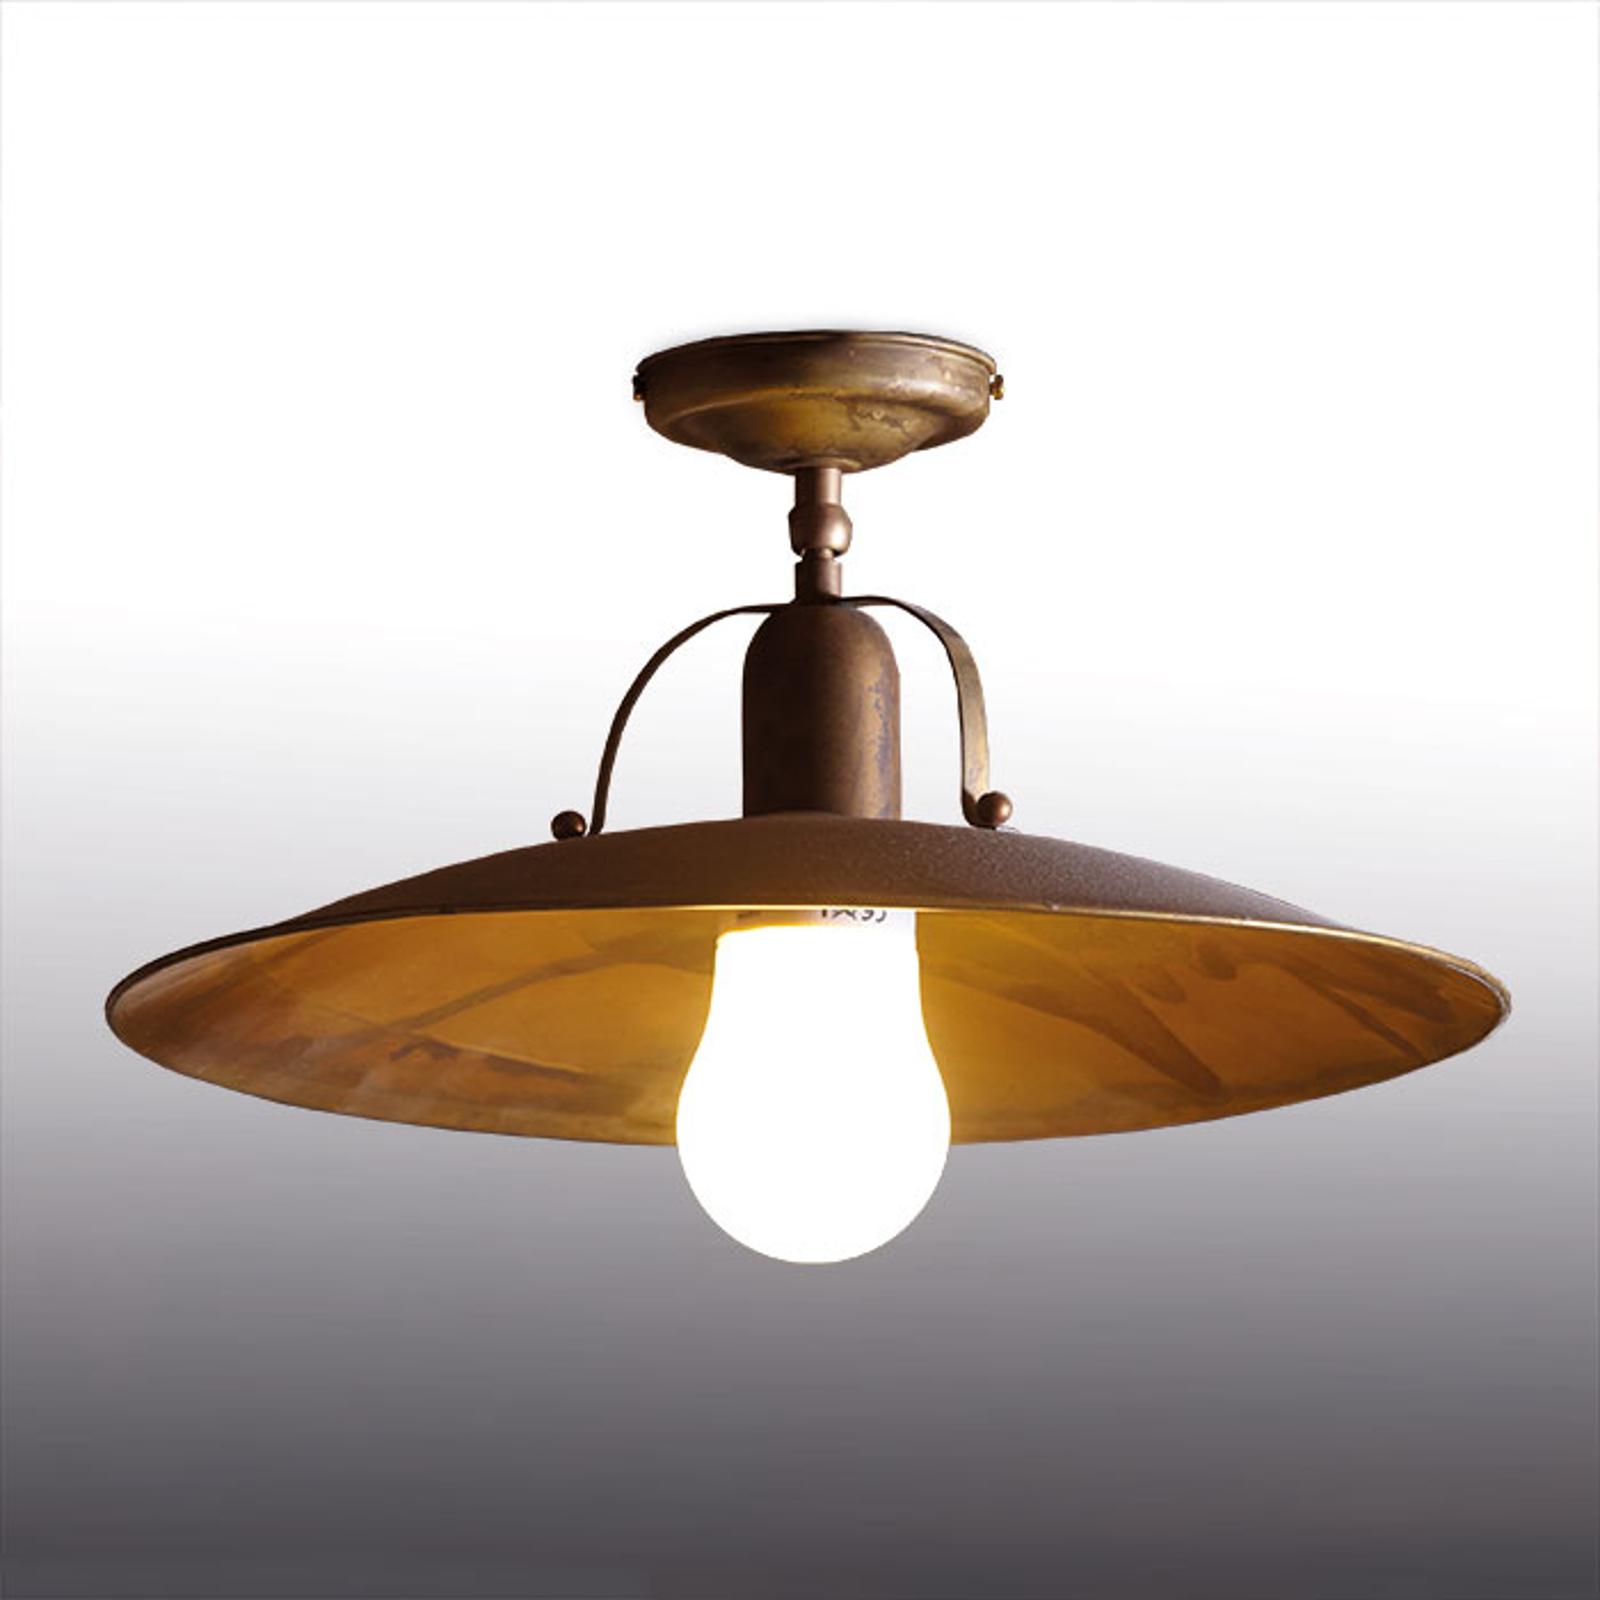 Rustiek werkende plafondlamp Osteria, 39 cm